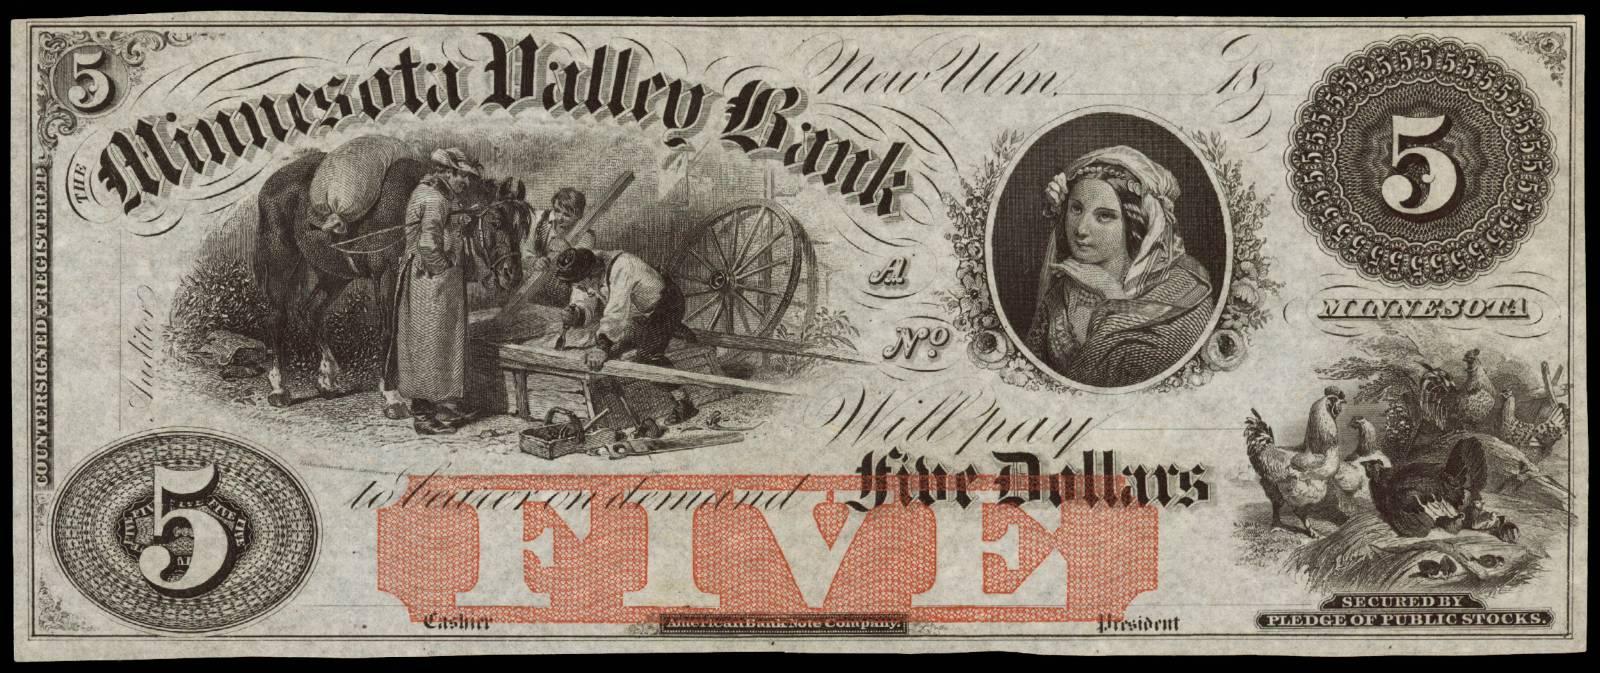 $5 Minnesota Valley Bank